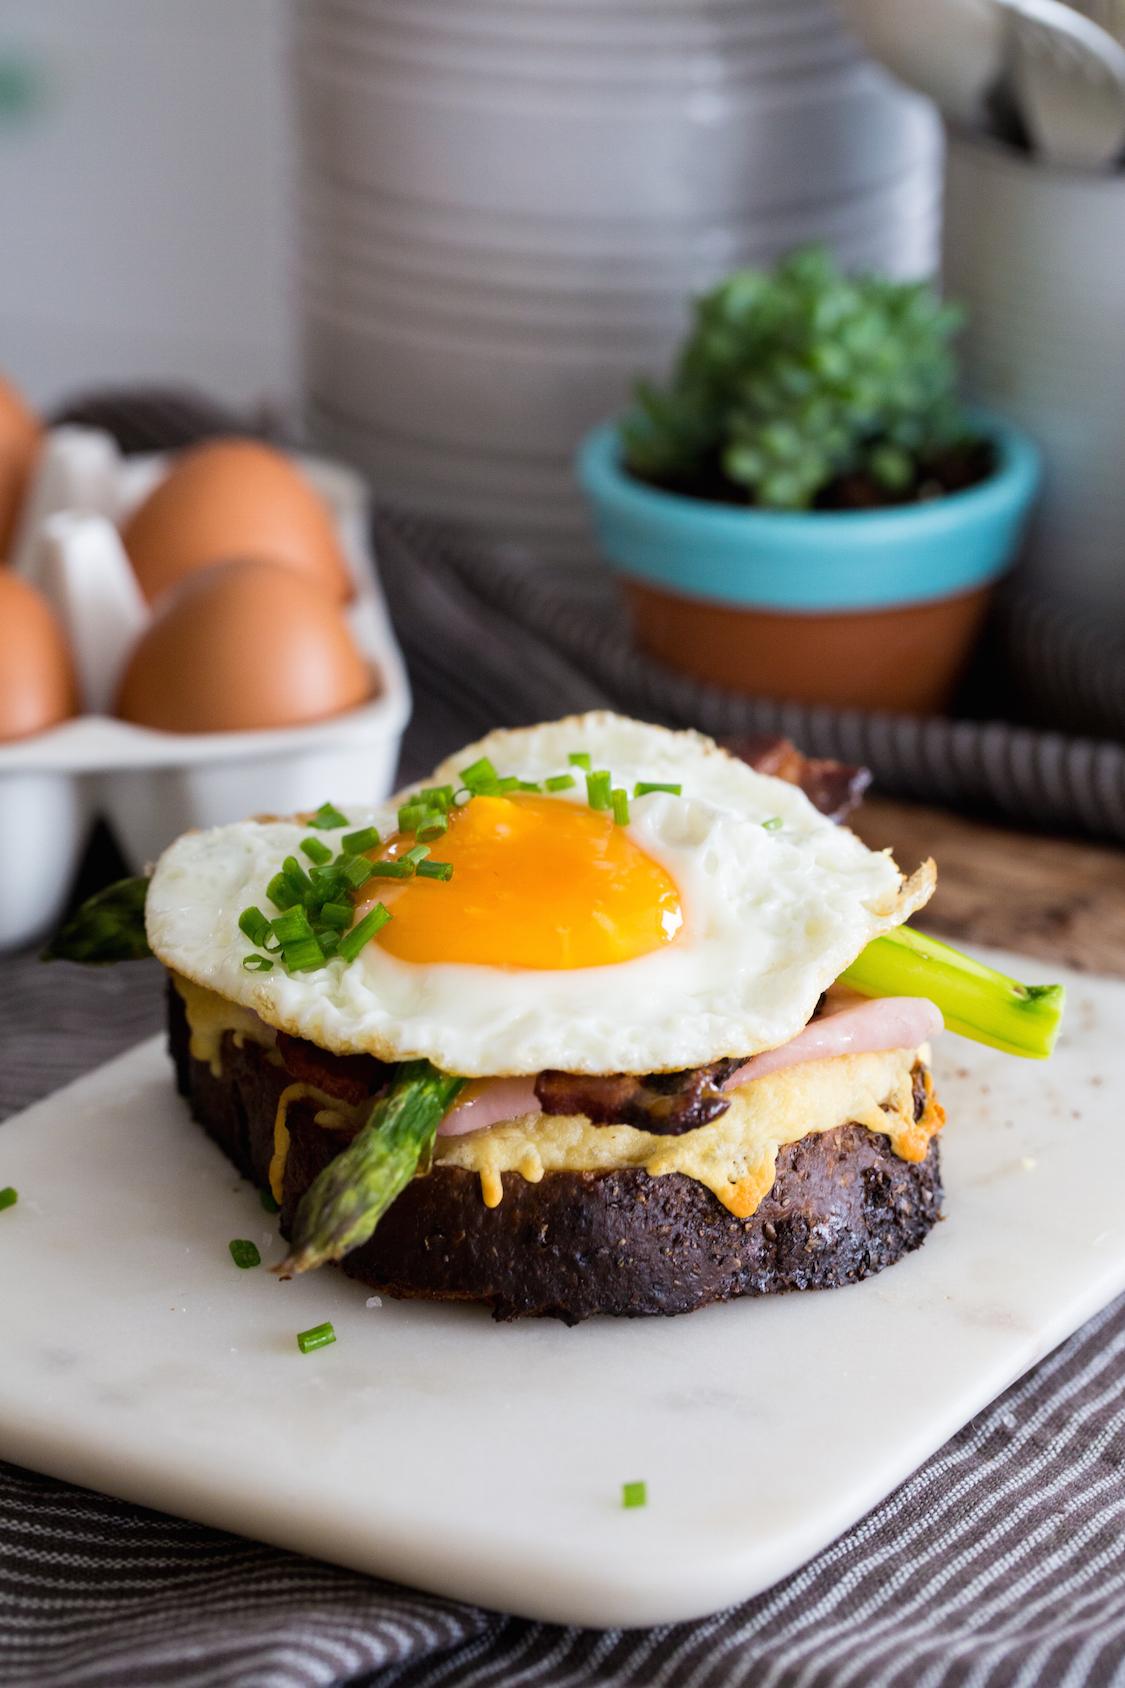 receita-tartine-americana-bacon-ovo-torrada-presunto-aspargos-dani-noce-3